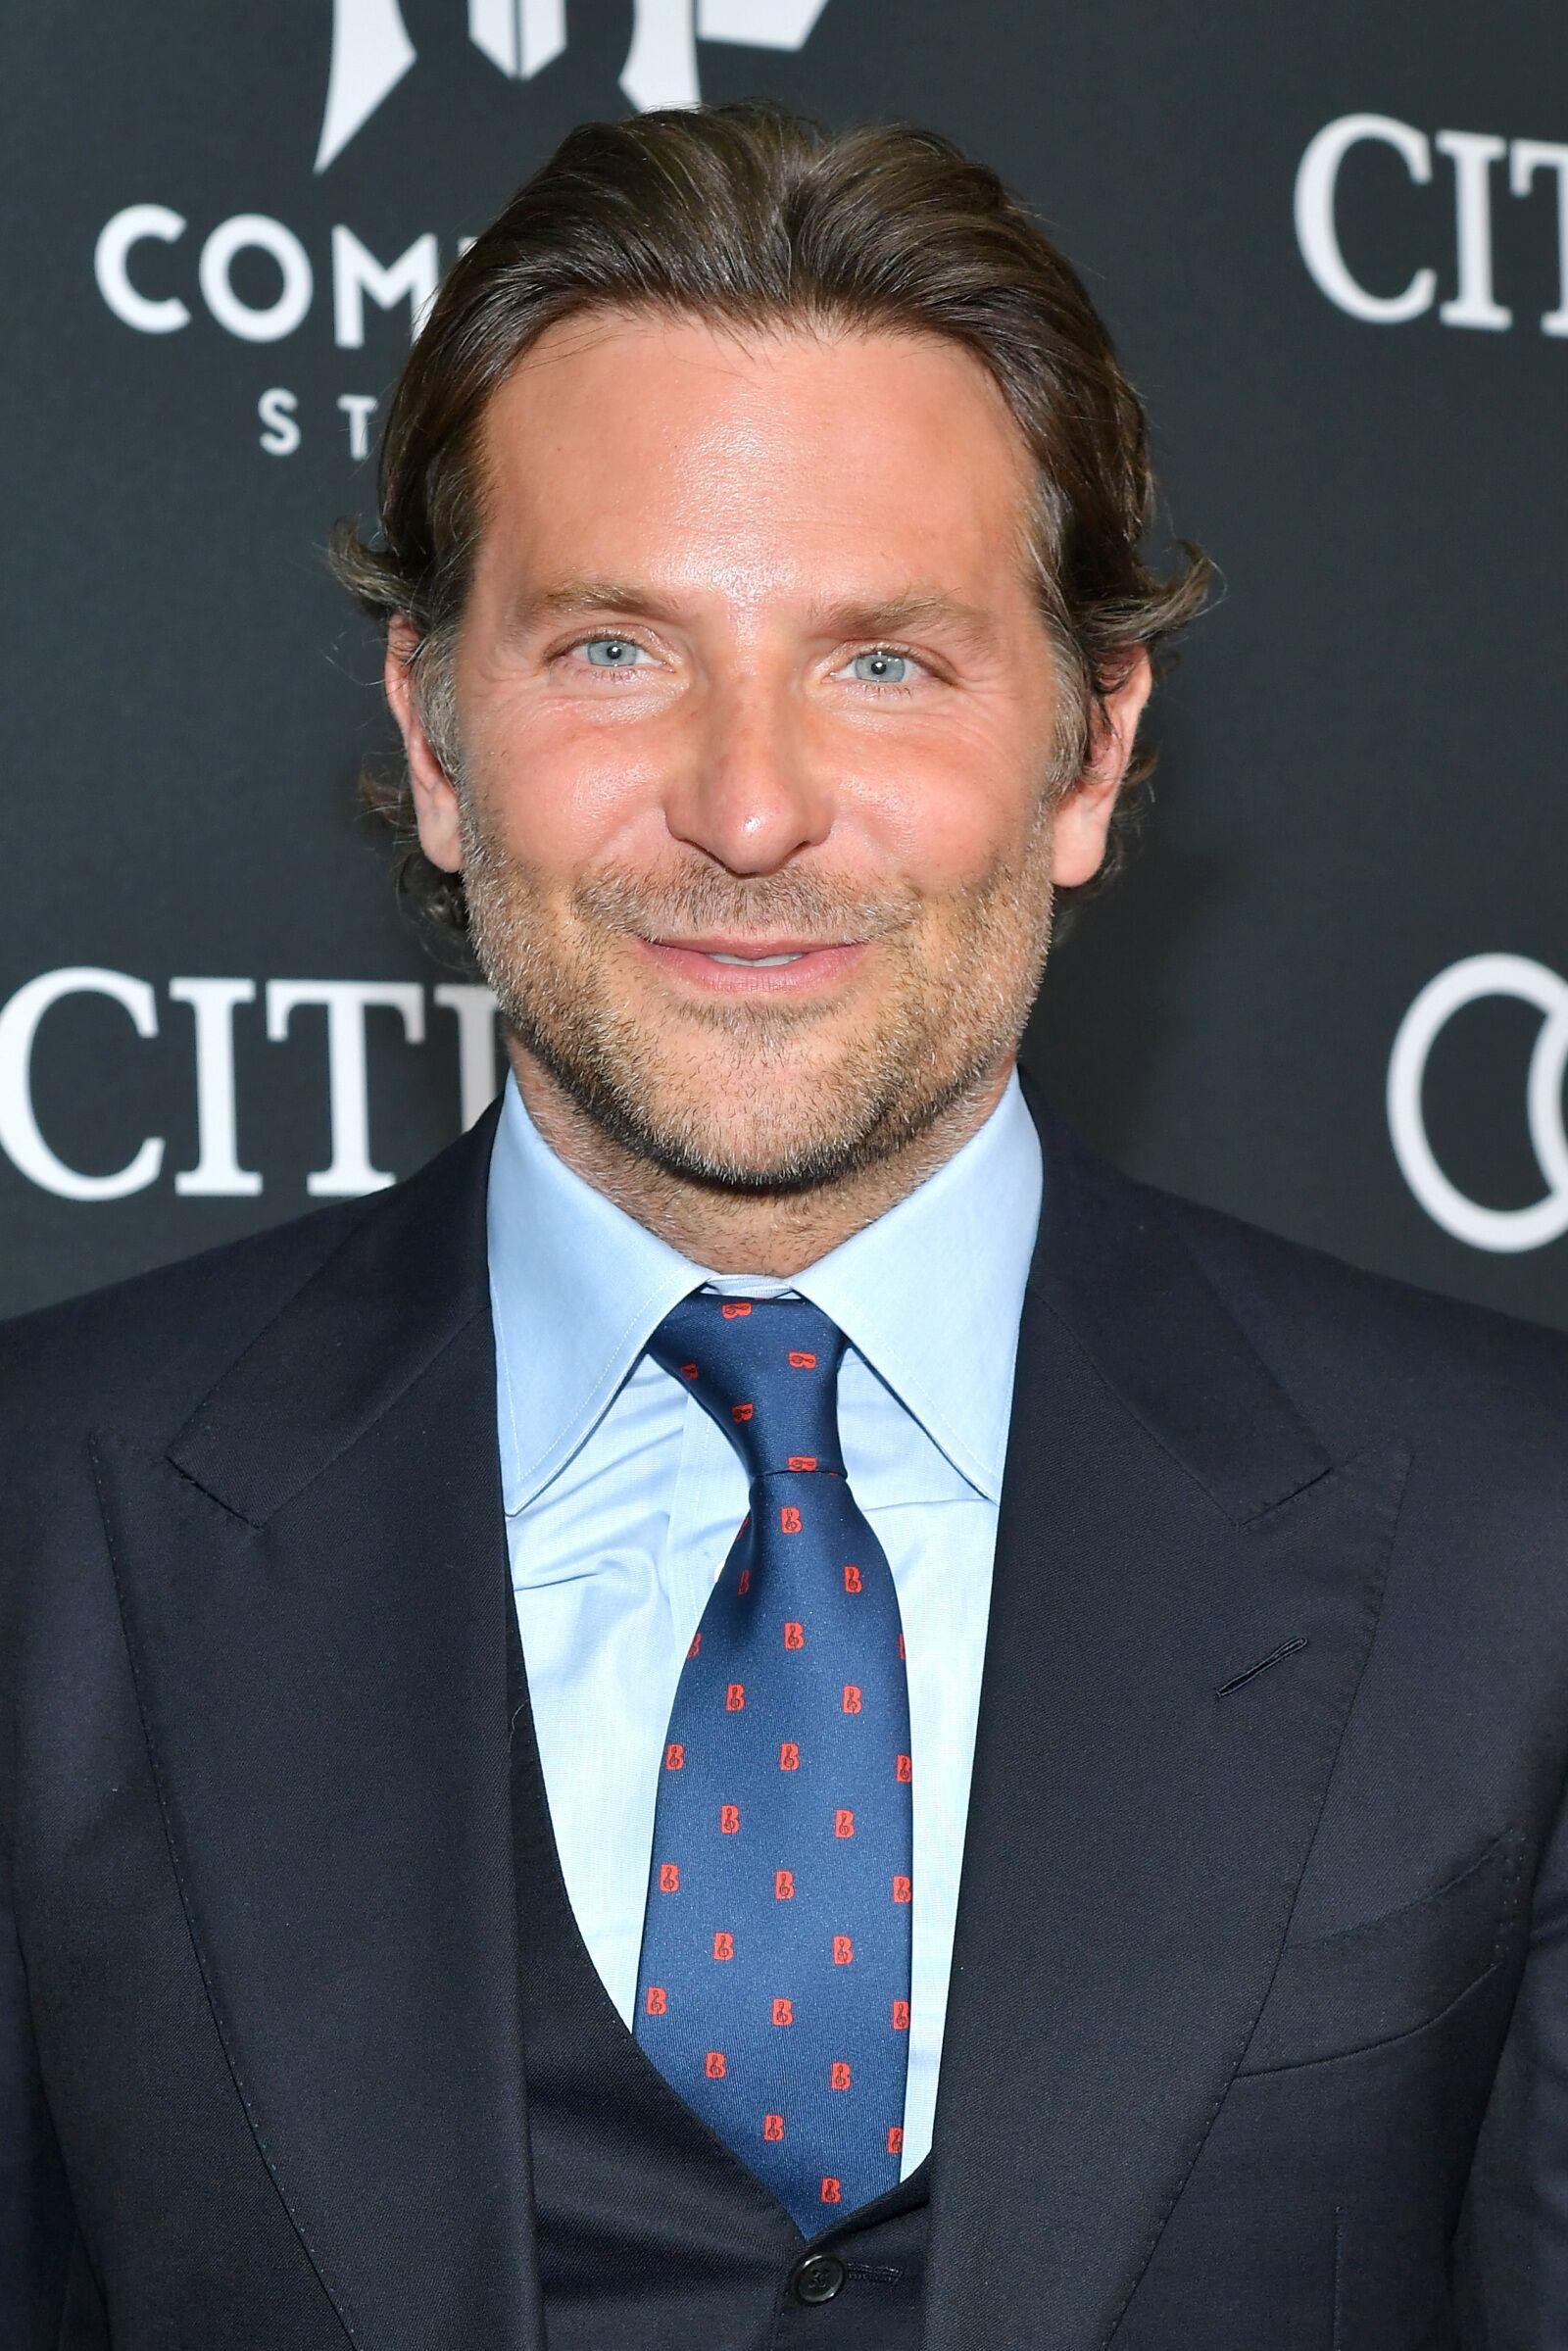 Irina Shayk, Bradley Cooper split, cuddles up with new man